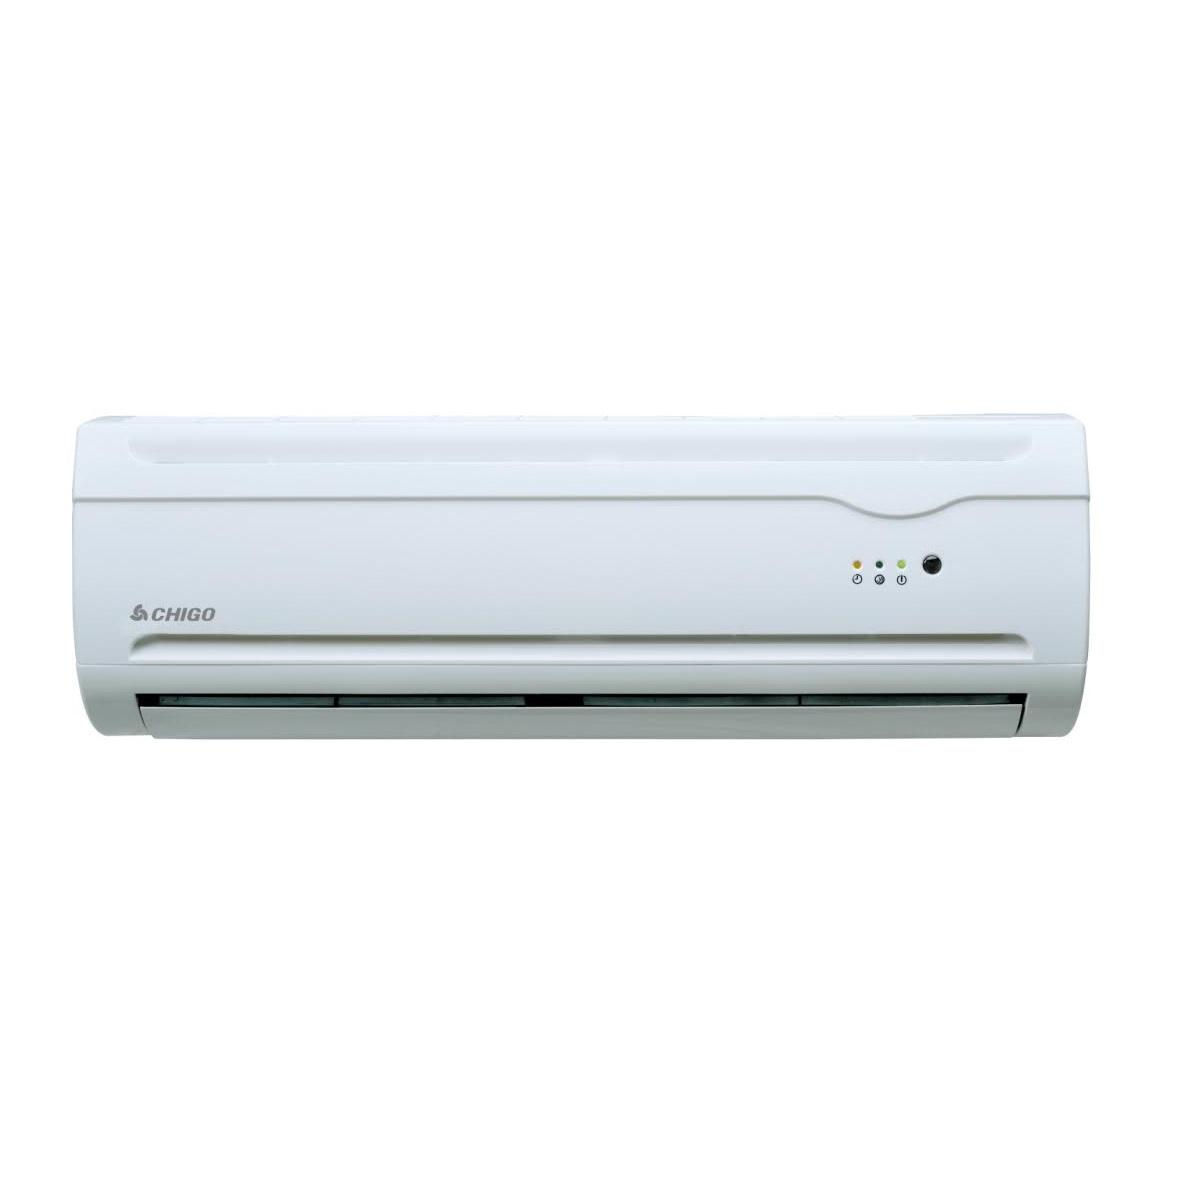 Quietest portable air conditioner 2018 dodge reviews for Split type ac